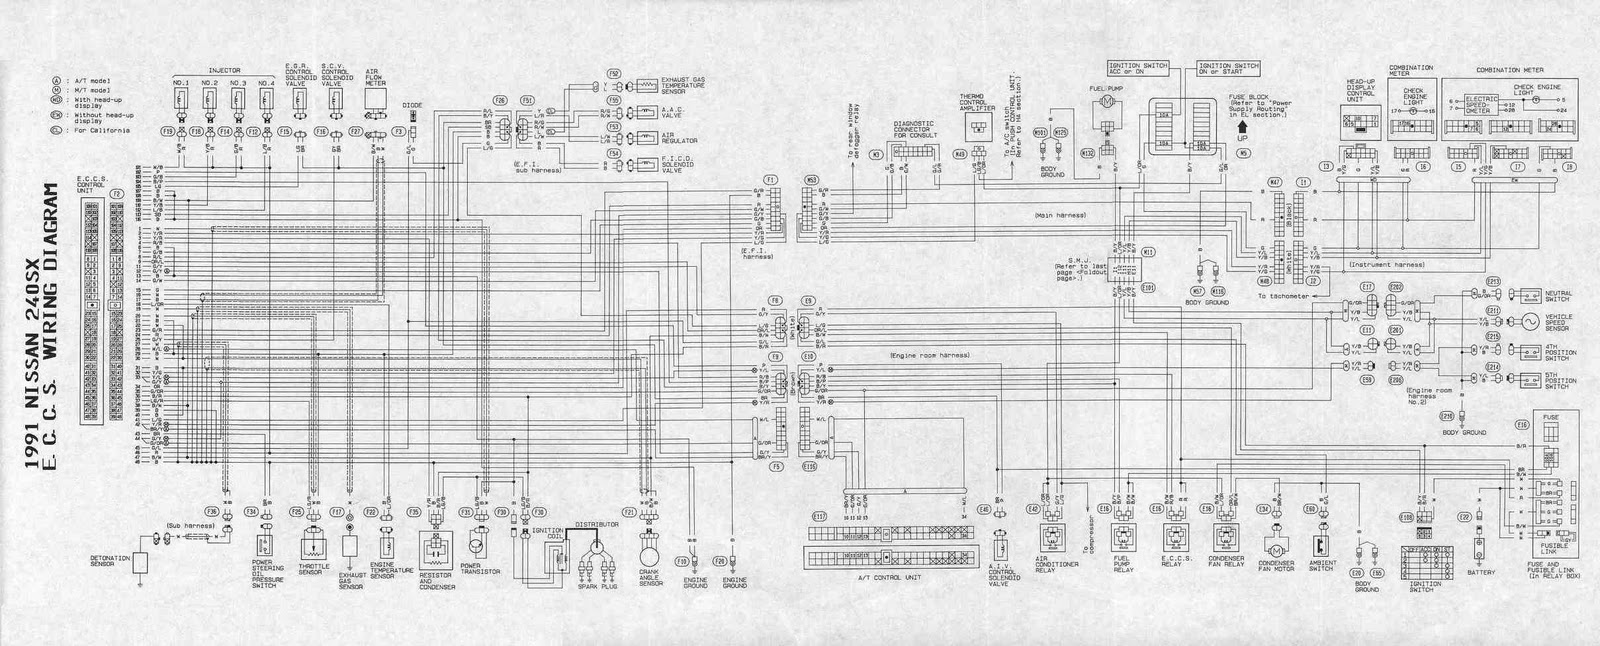 Gemütlich Epiphone G10 Single Humbucker Schaltplan Fotos ...